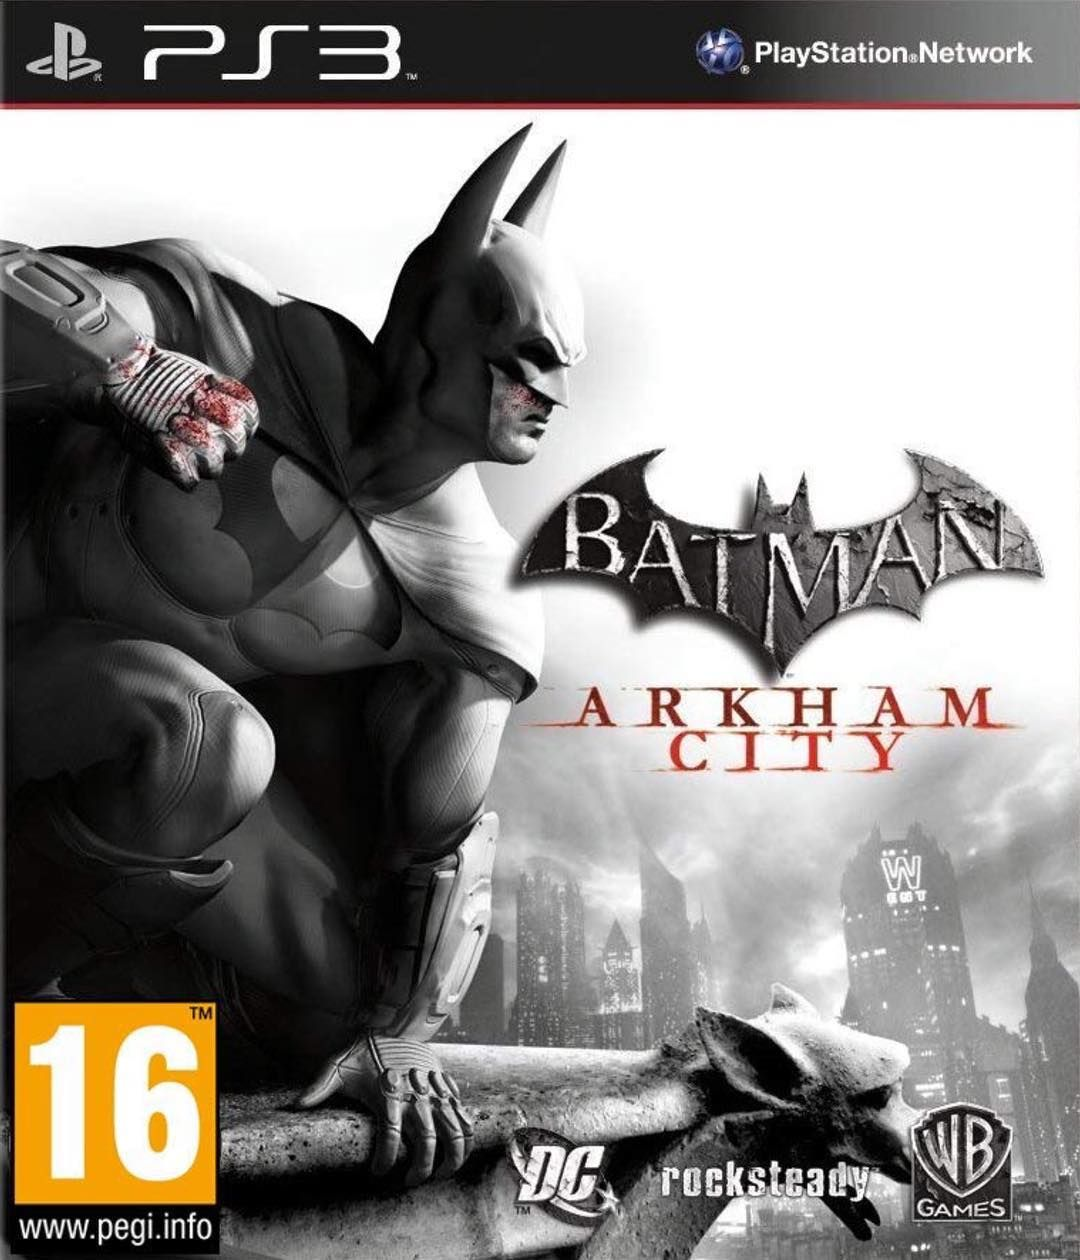 Image May Contain Text Batman Arkham City Arkham City Batman Arkham